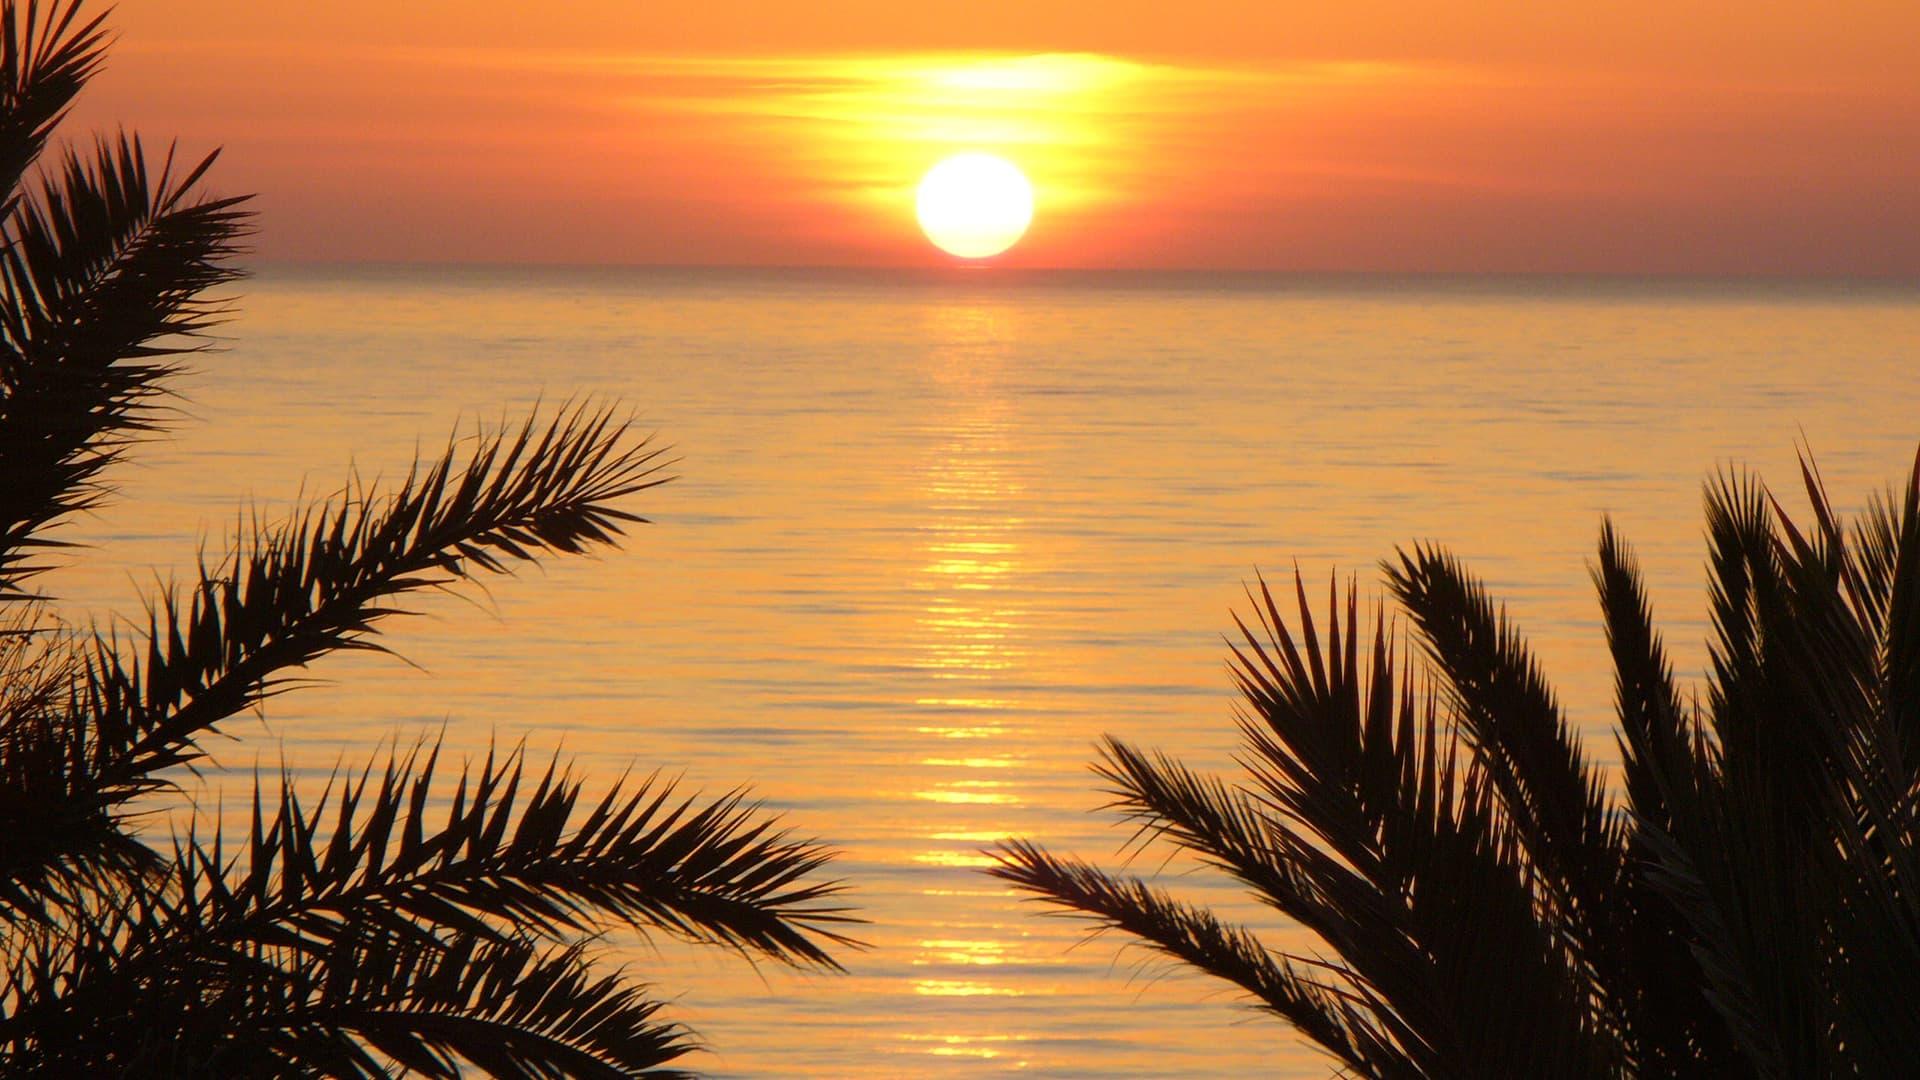 Картинки моря в тунисе